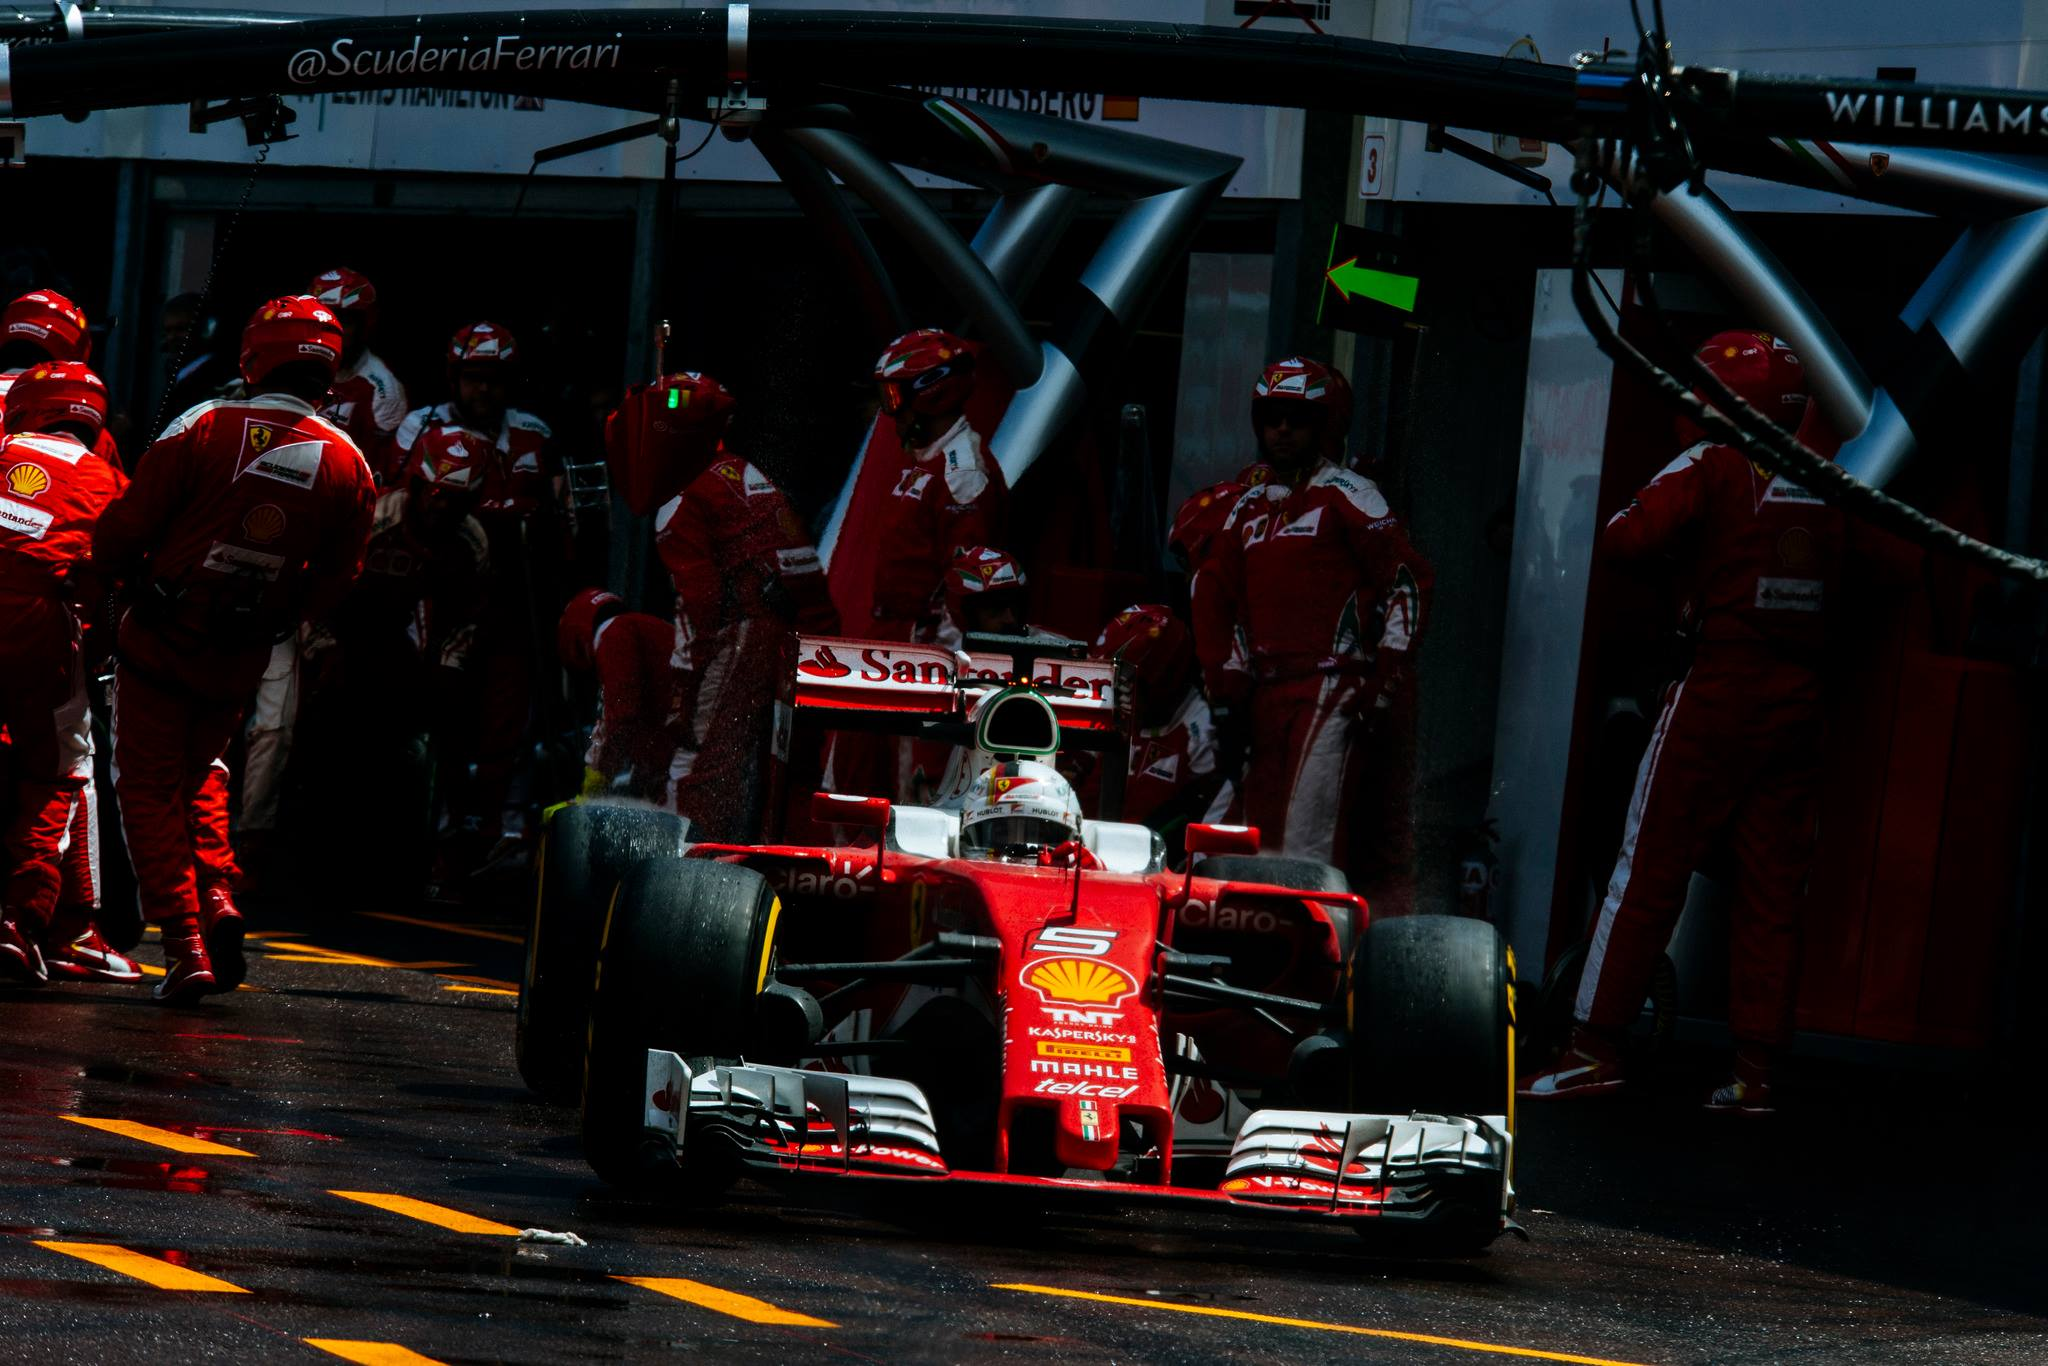 Monaco_domingo_2016_racef1 (2)